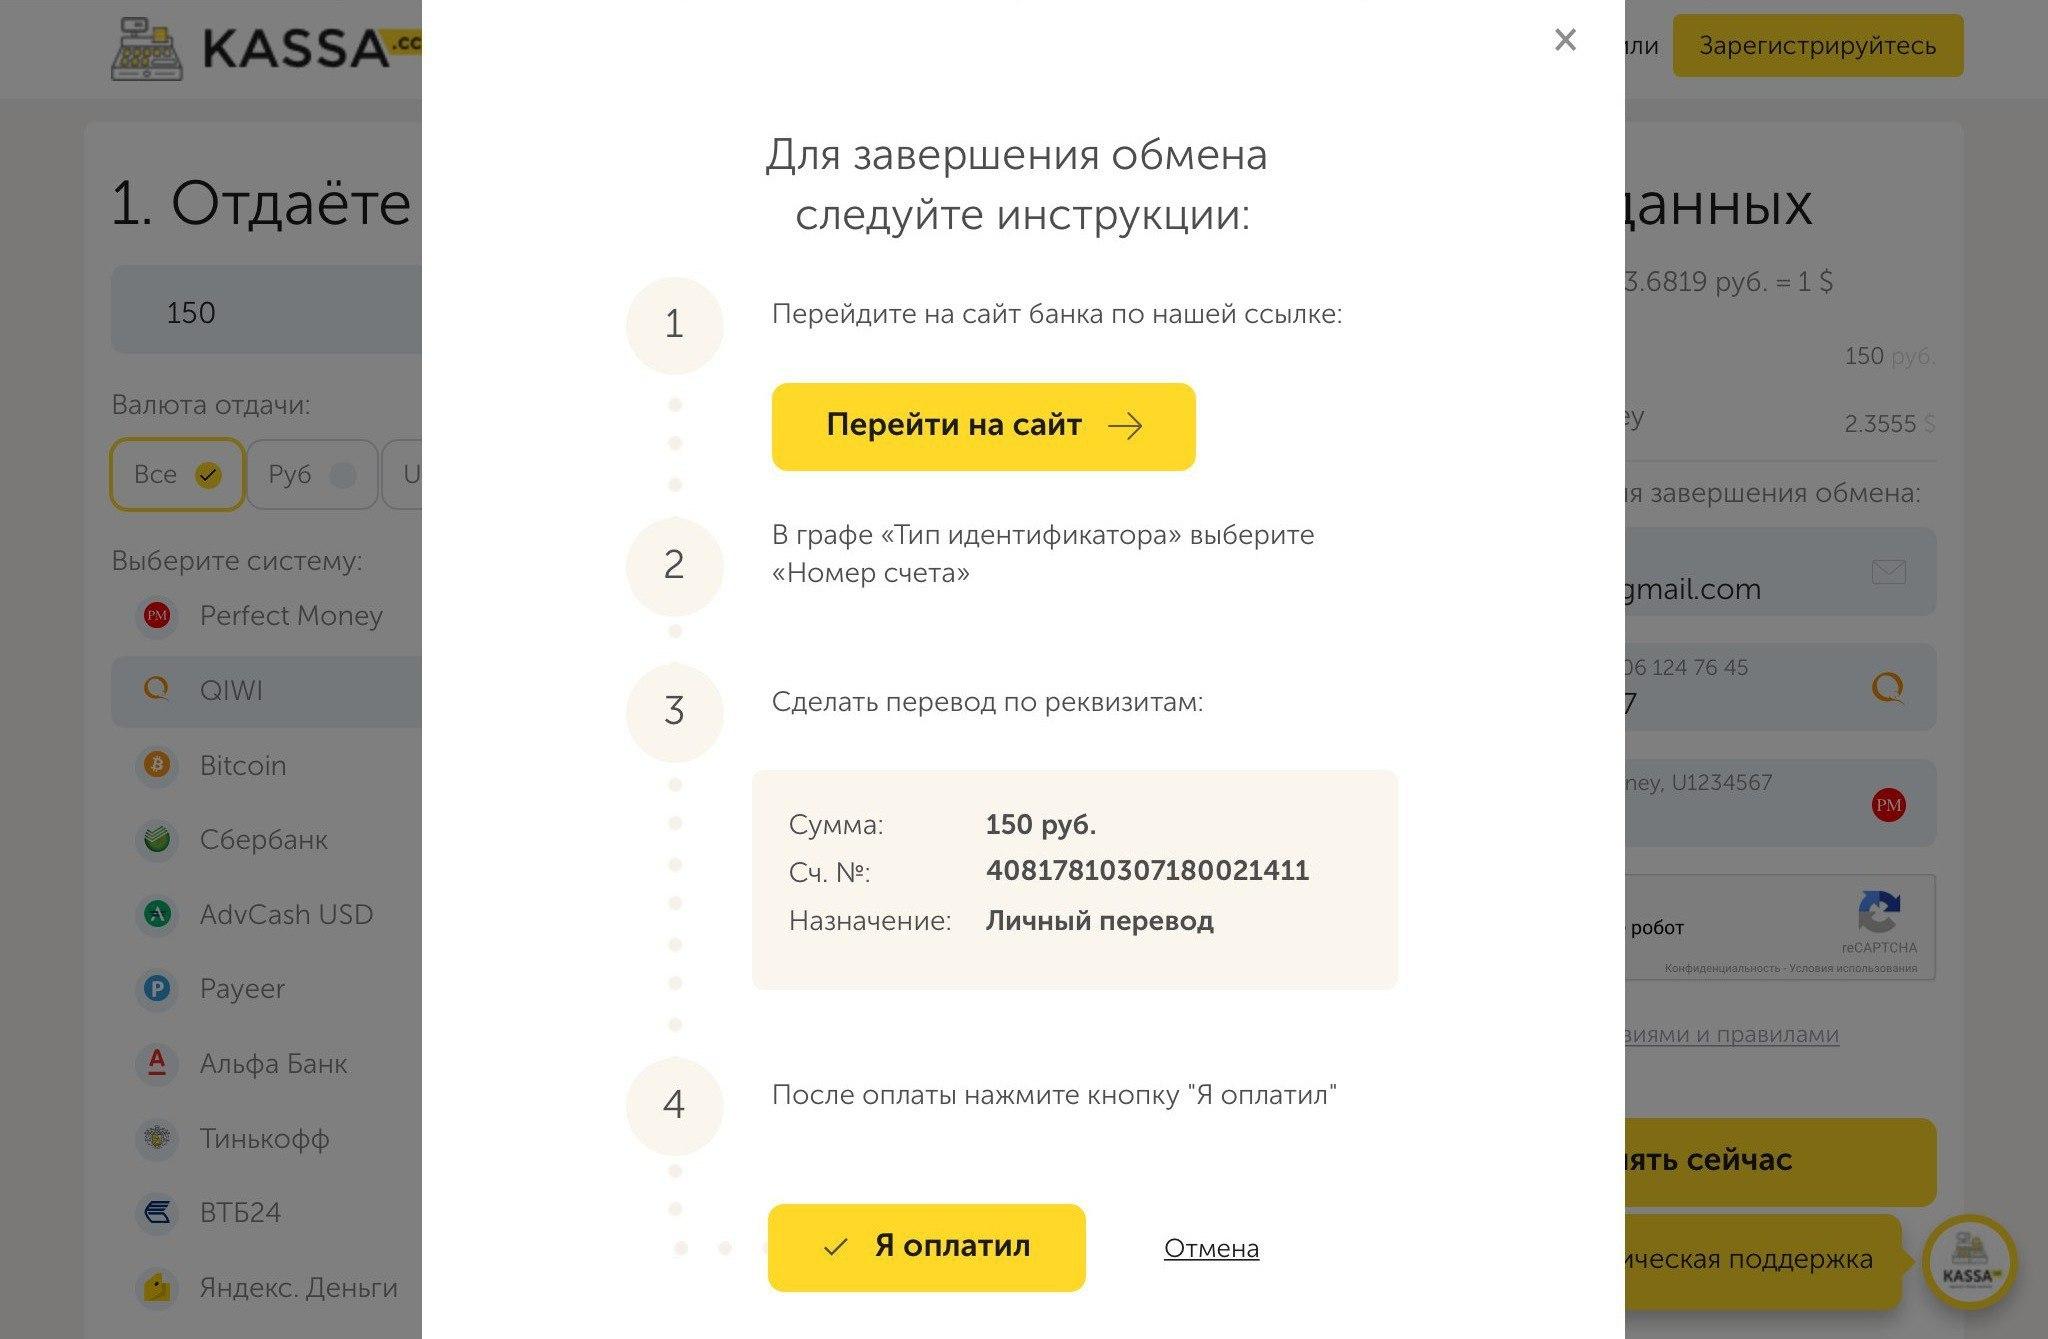 Kassa.cc - единый обмен валюты. Обмен QIWI RUB на Perfect Money USD